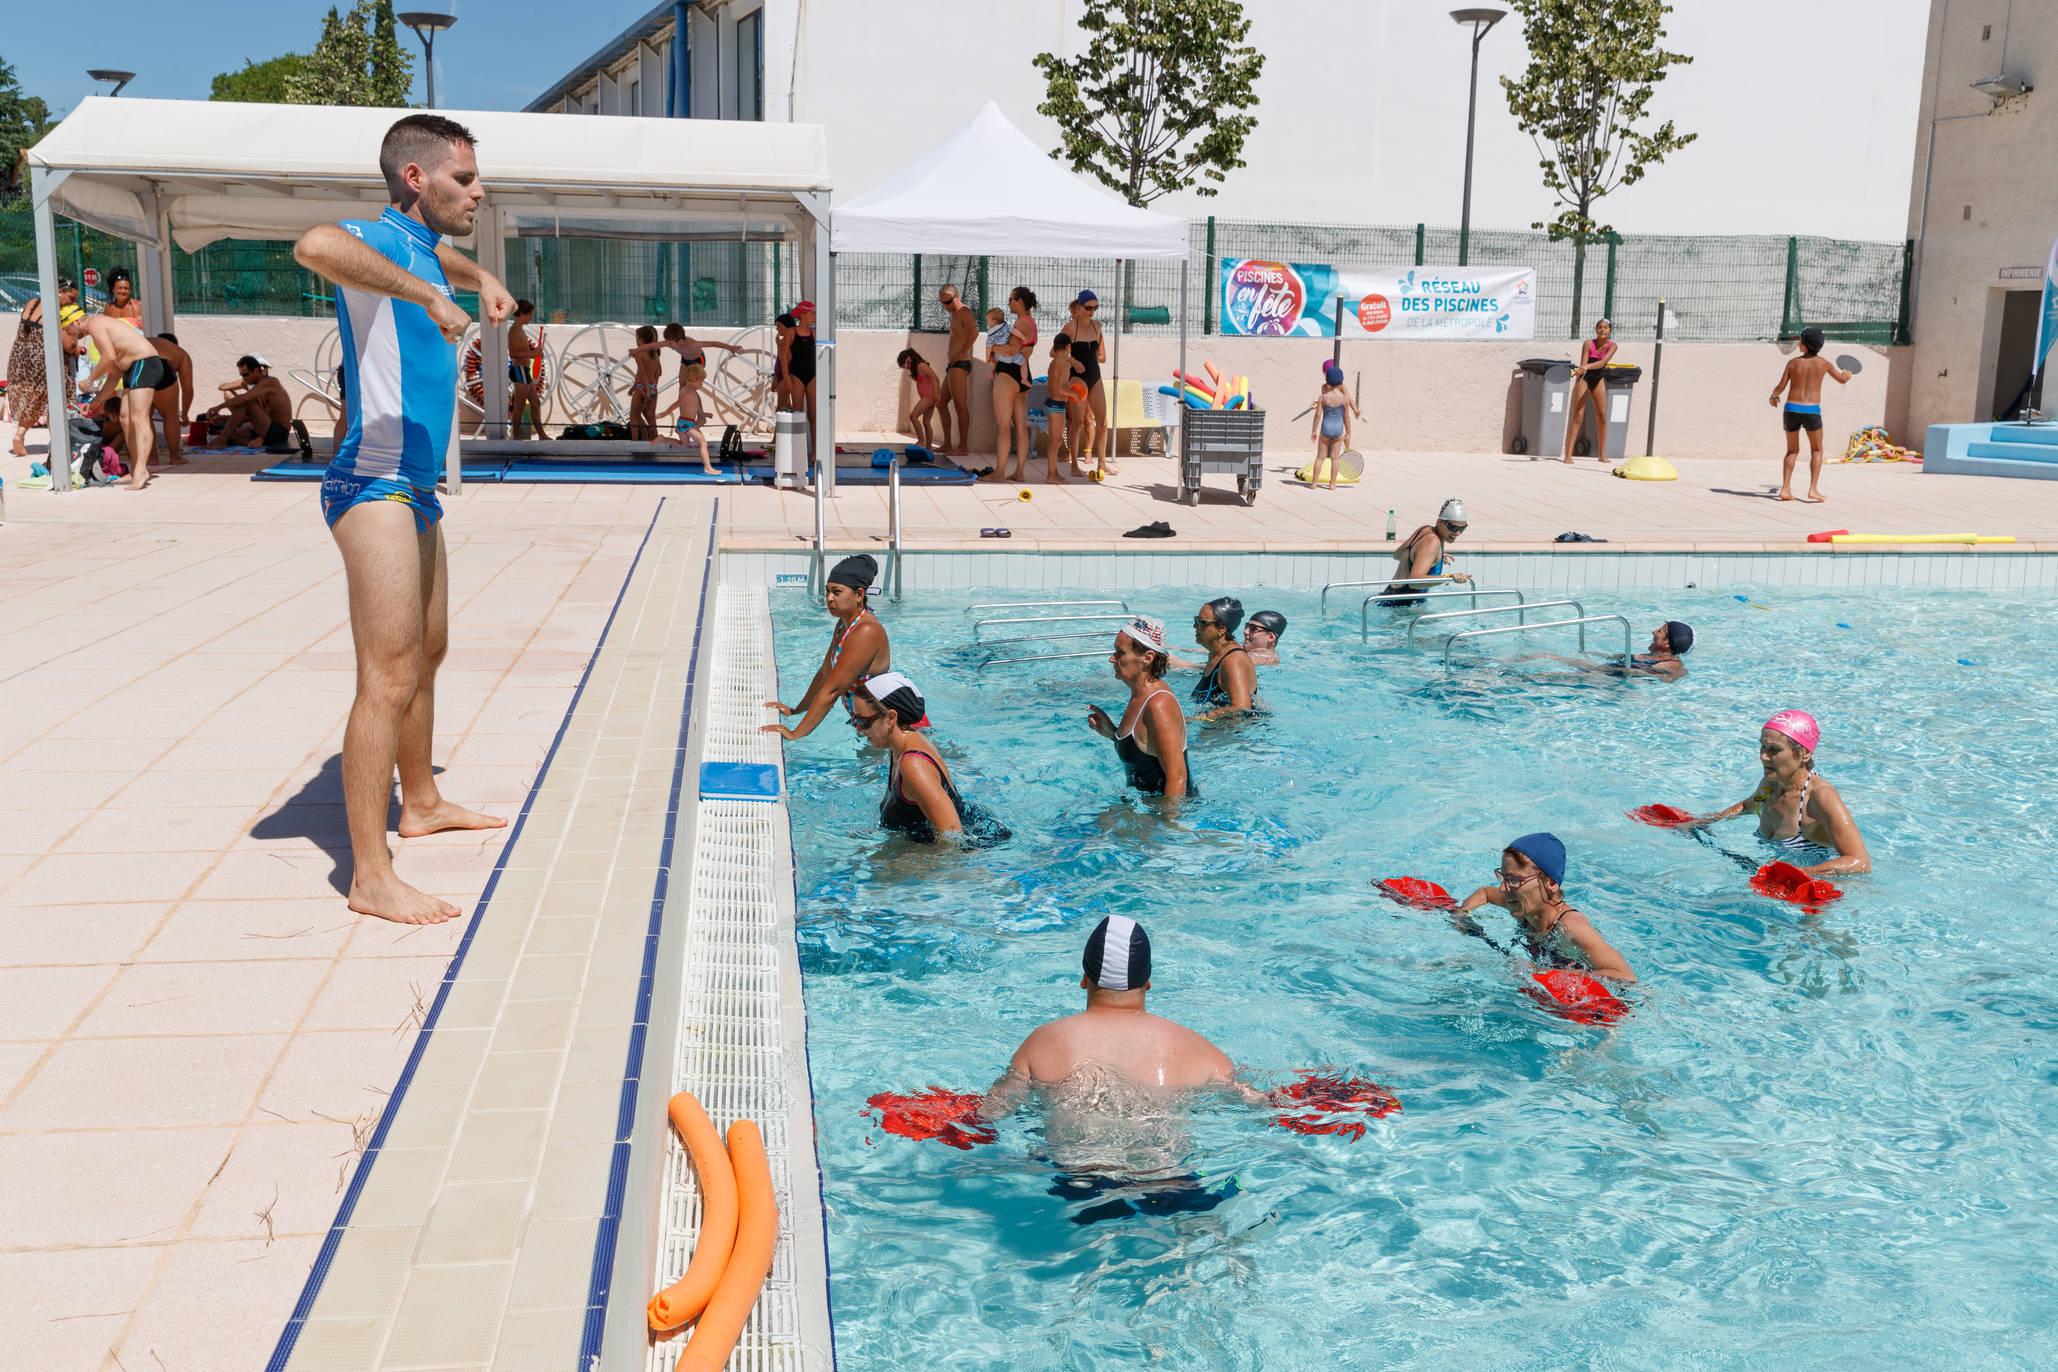 Piscine Christine Caron, Swimming-Pool - Montpellier Tourist ... destiné Piscine Originale